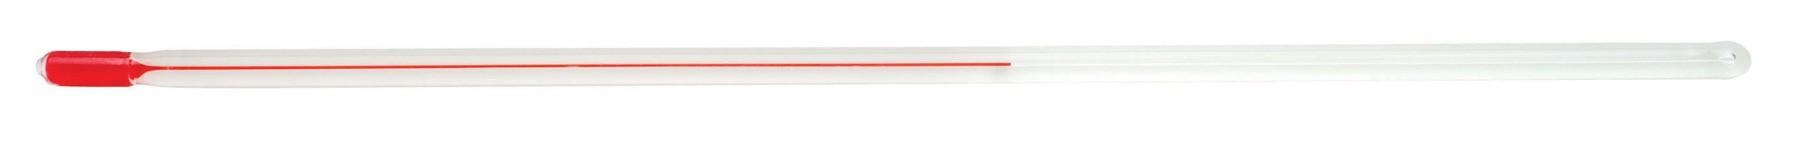 H-B DURAC Liquid-In-Glass Ungraduated Thermometer; Organic Liquid Filled